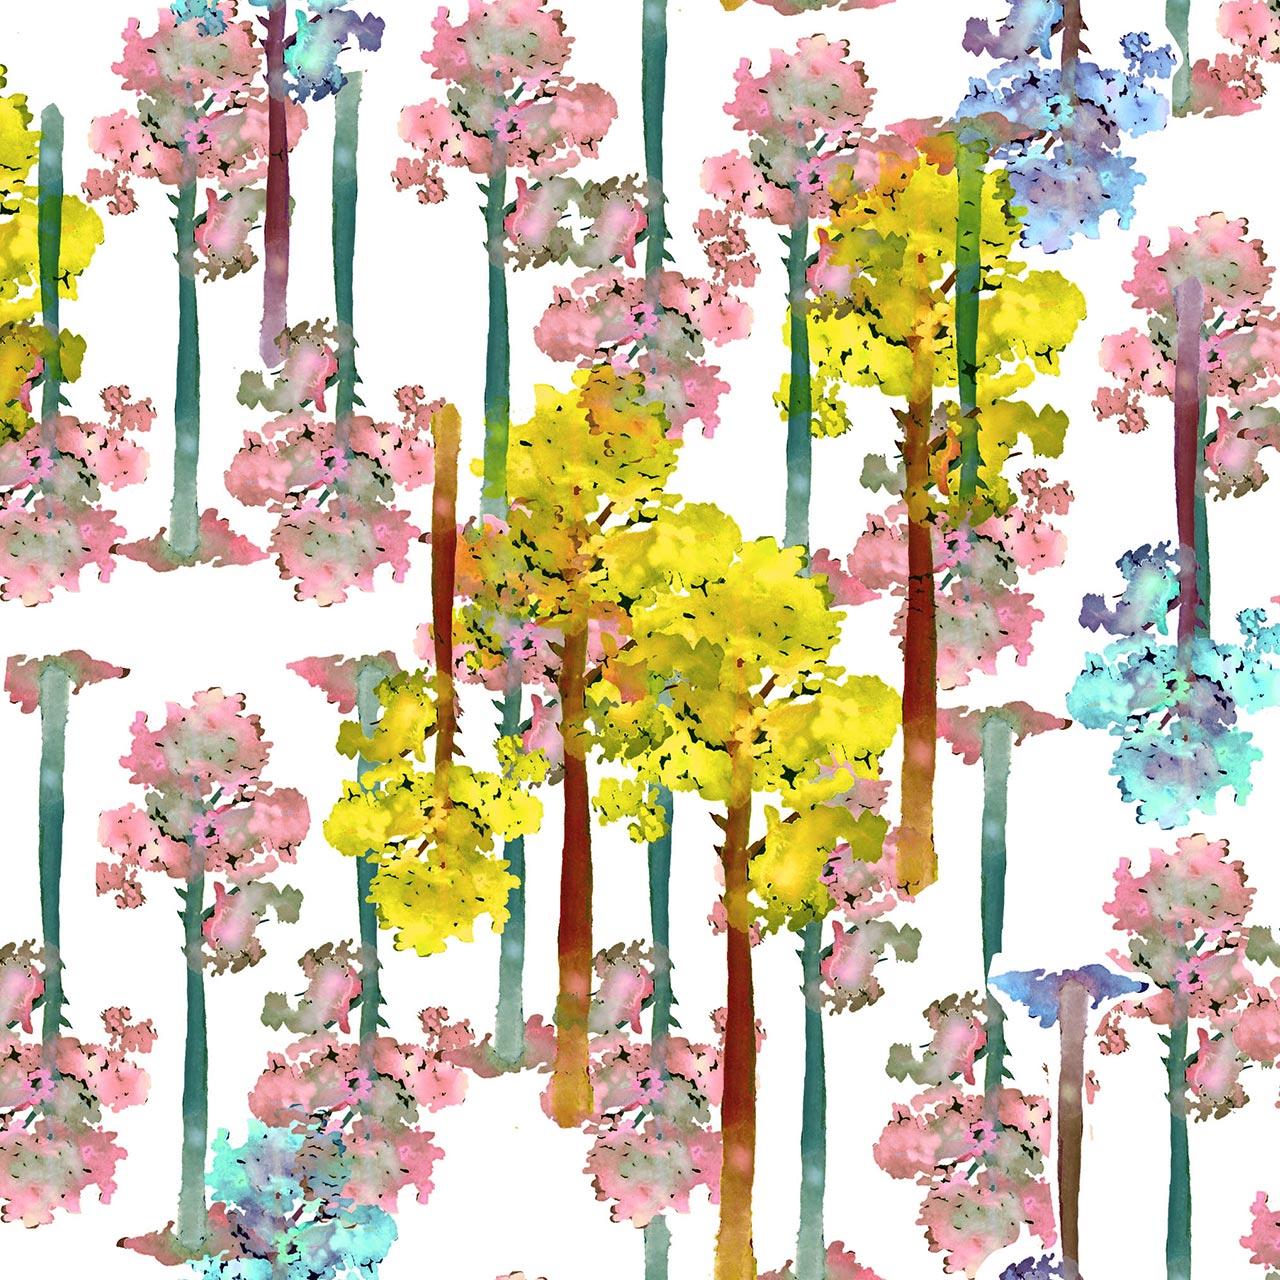 ivana helsinki rose pines